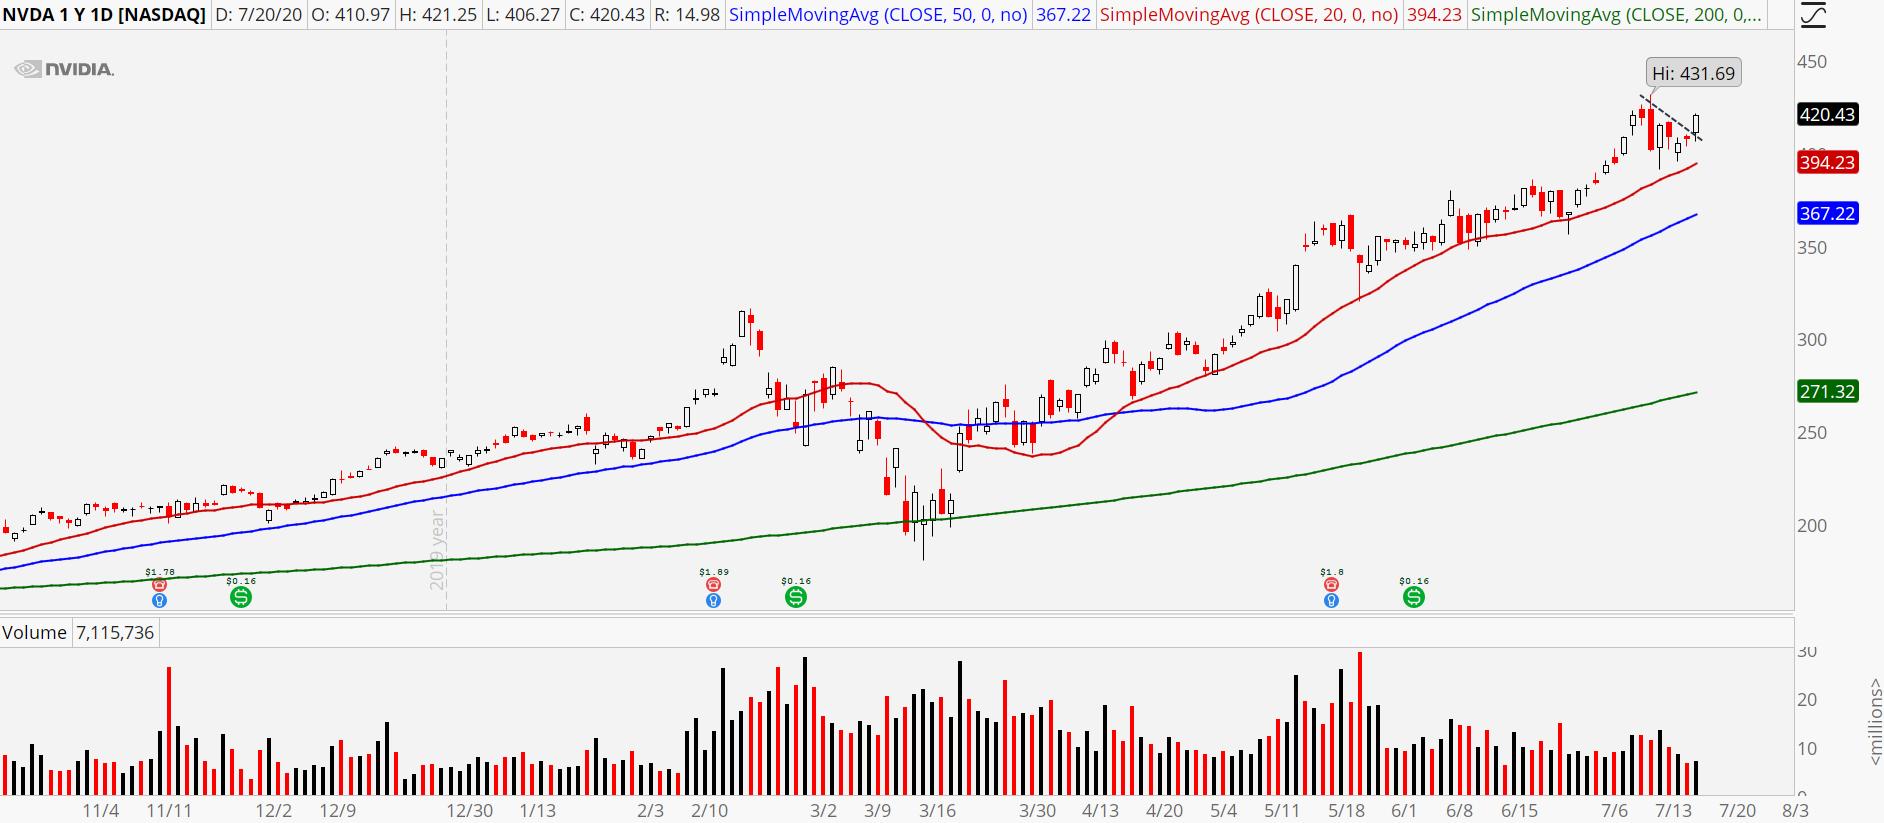 Nvidia (NVDA) stock chart showing Monday's surge